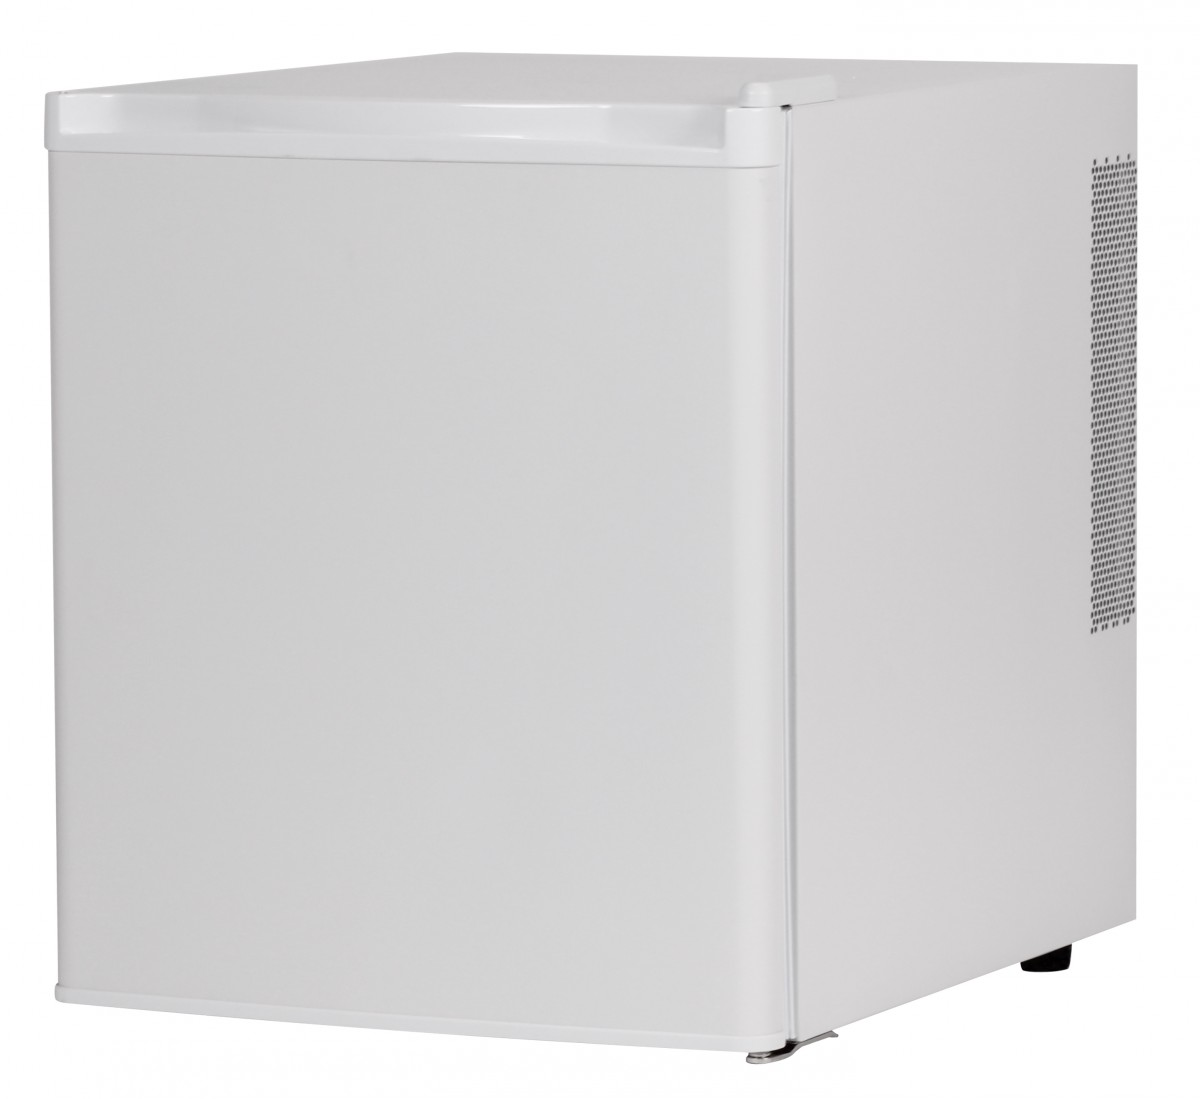 AMSTYLE Mini Kühlschrank Minibar weiß 46 Liter 5° - 15°C ...